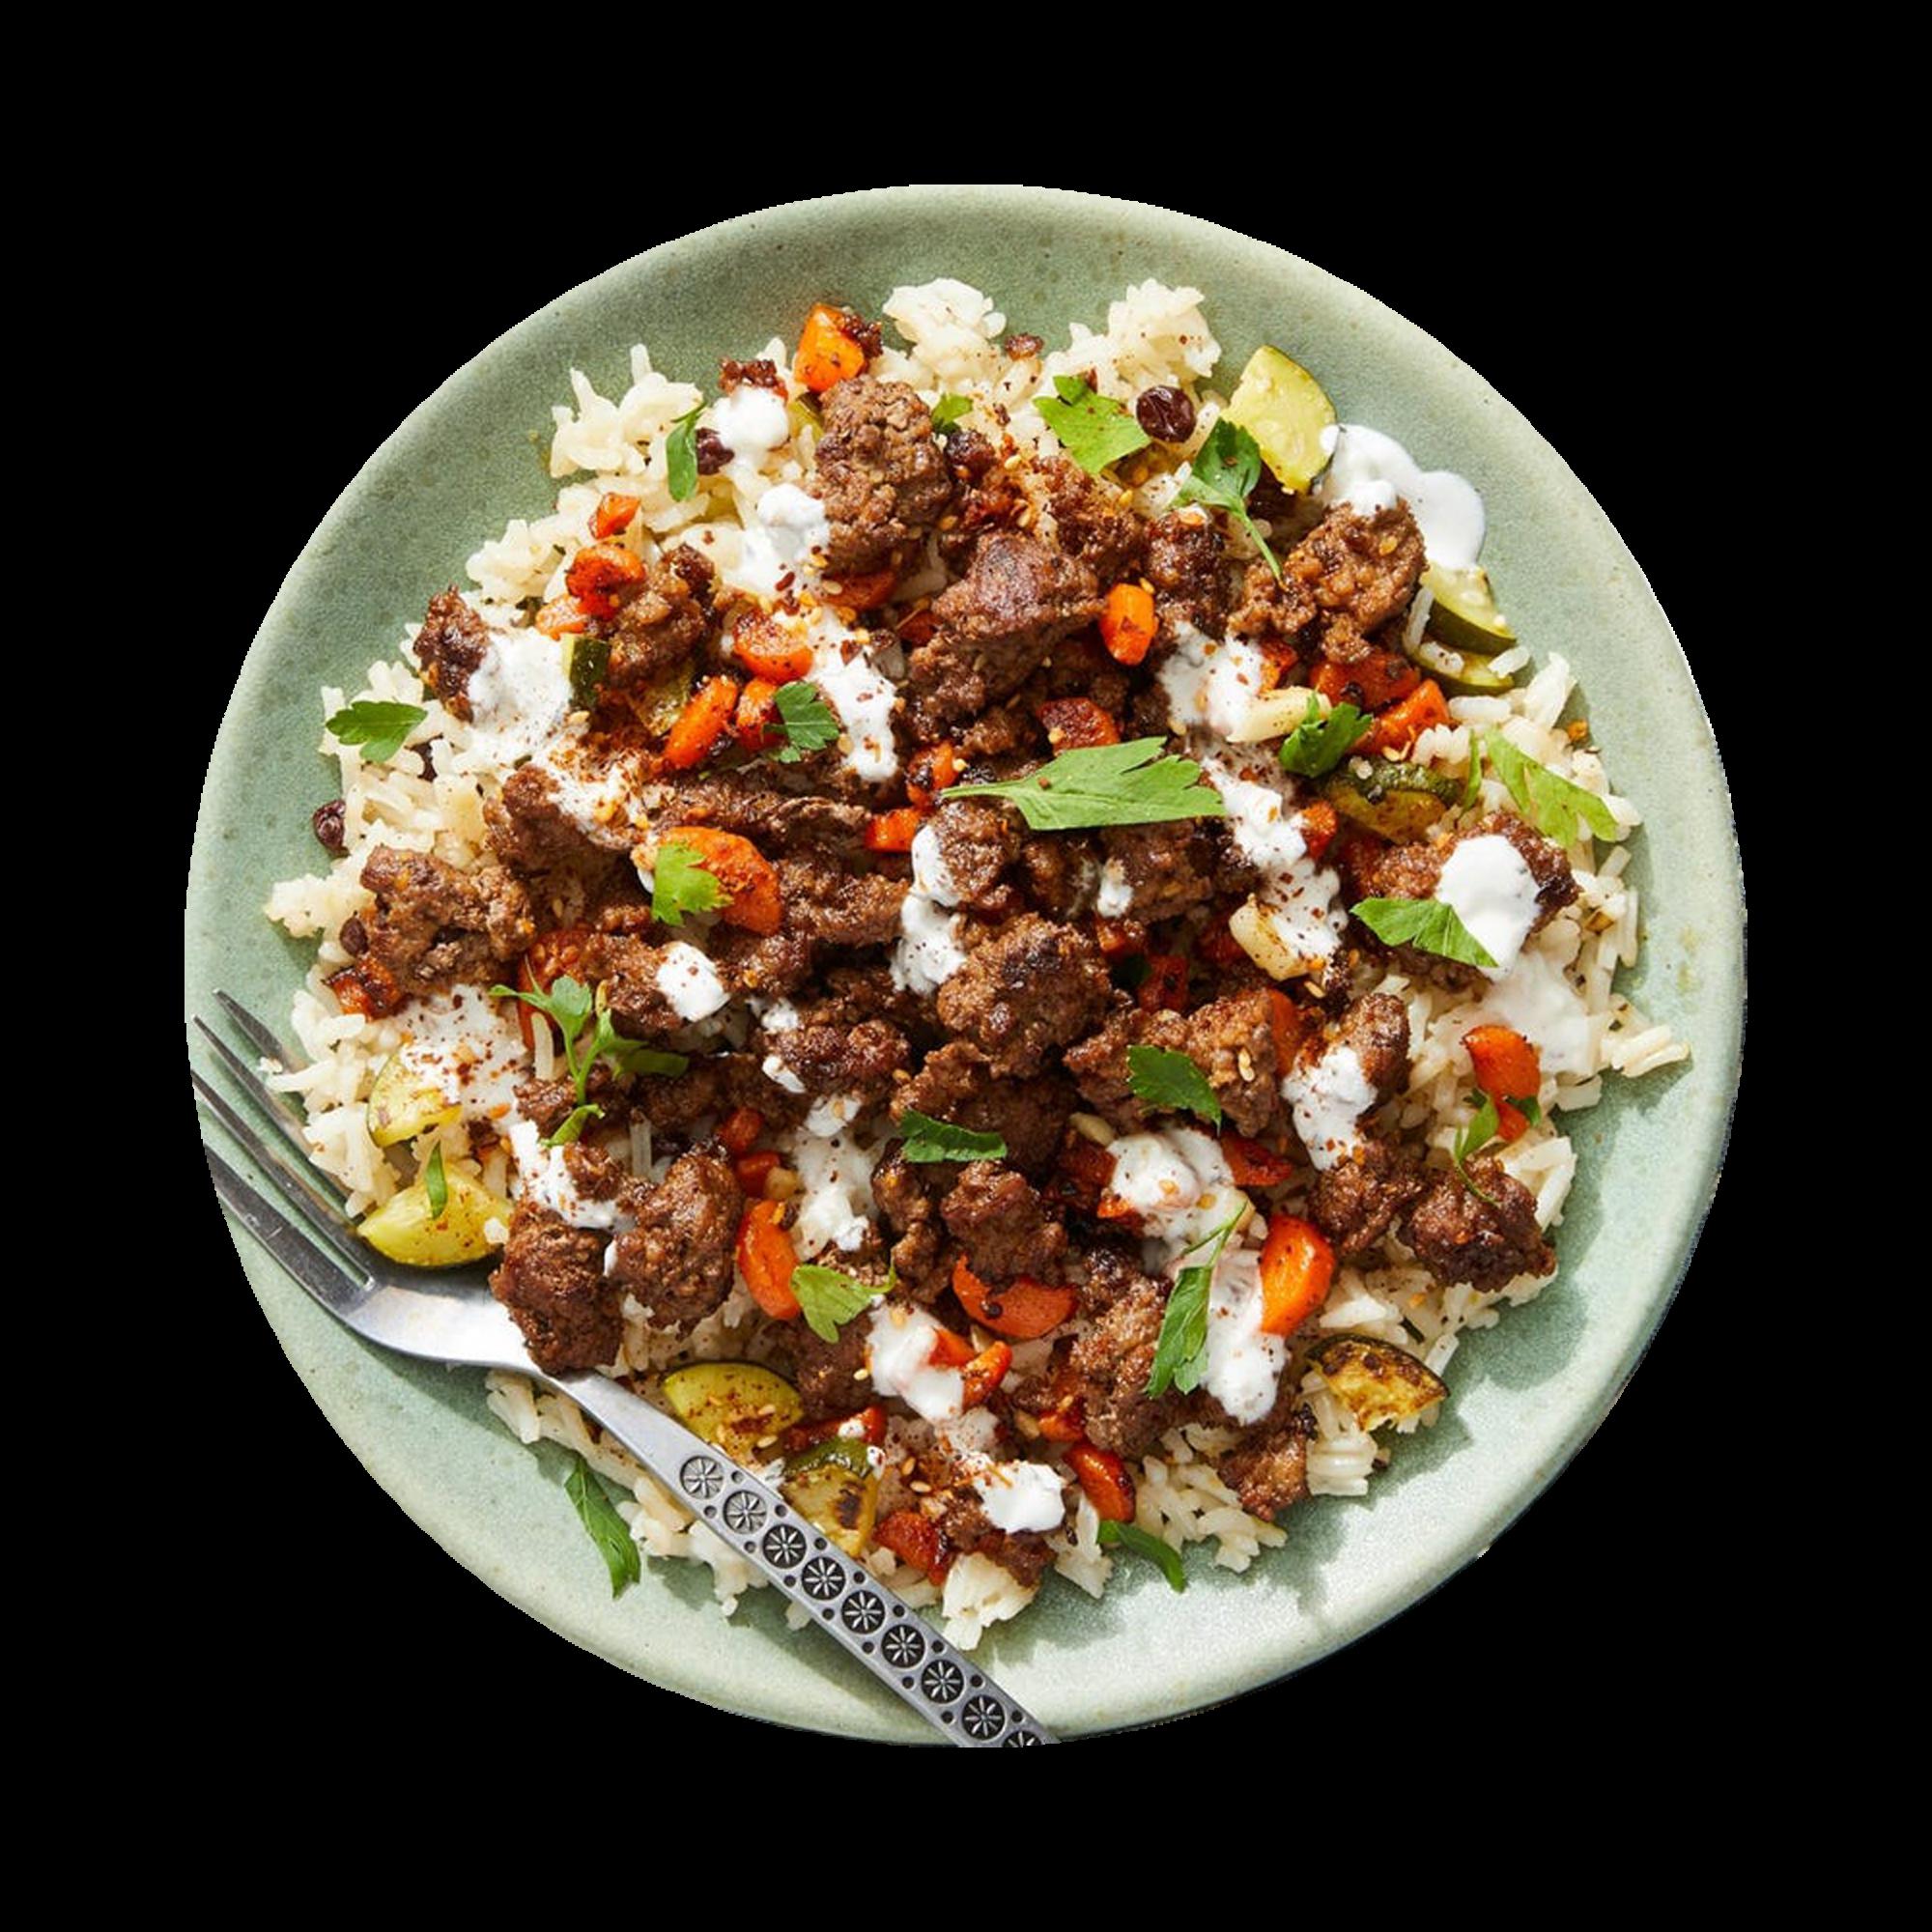 Za'atar Minced Chicken with Carrot Zucchini Rice & Yoghurt